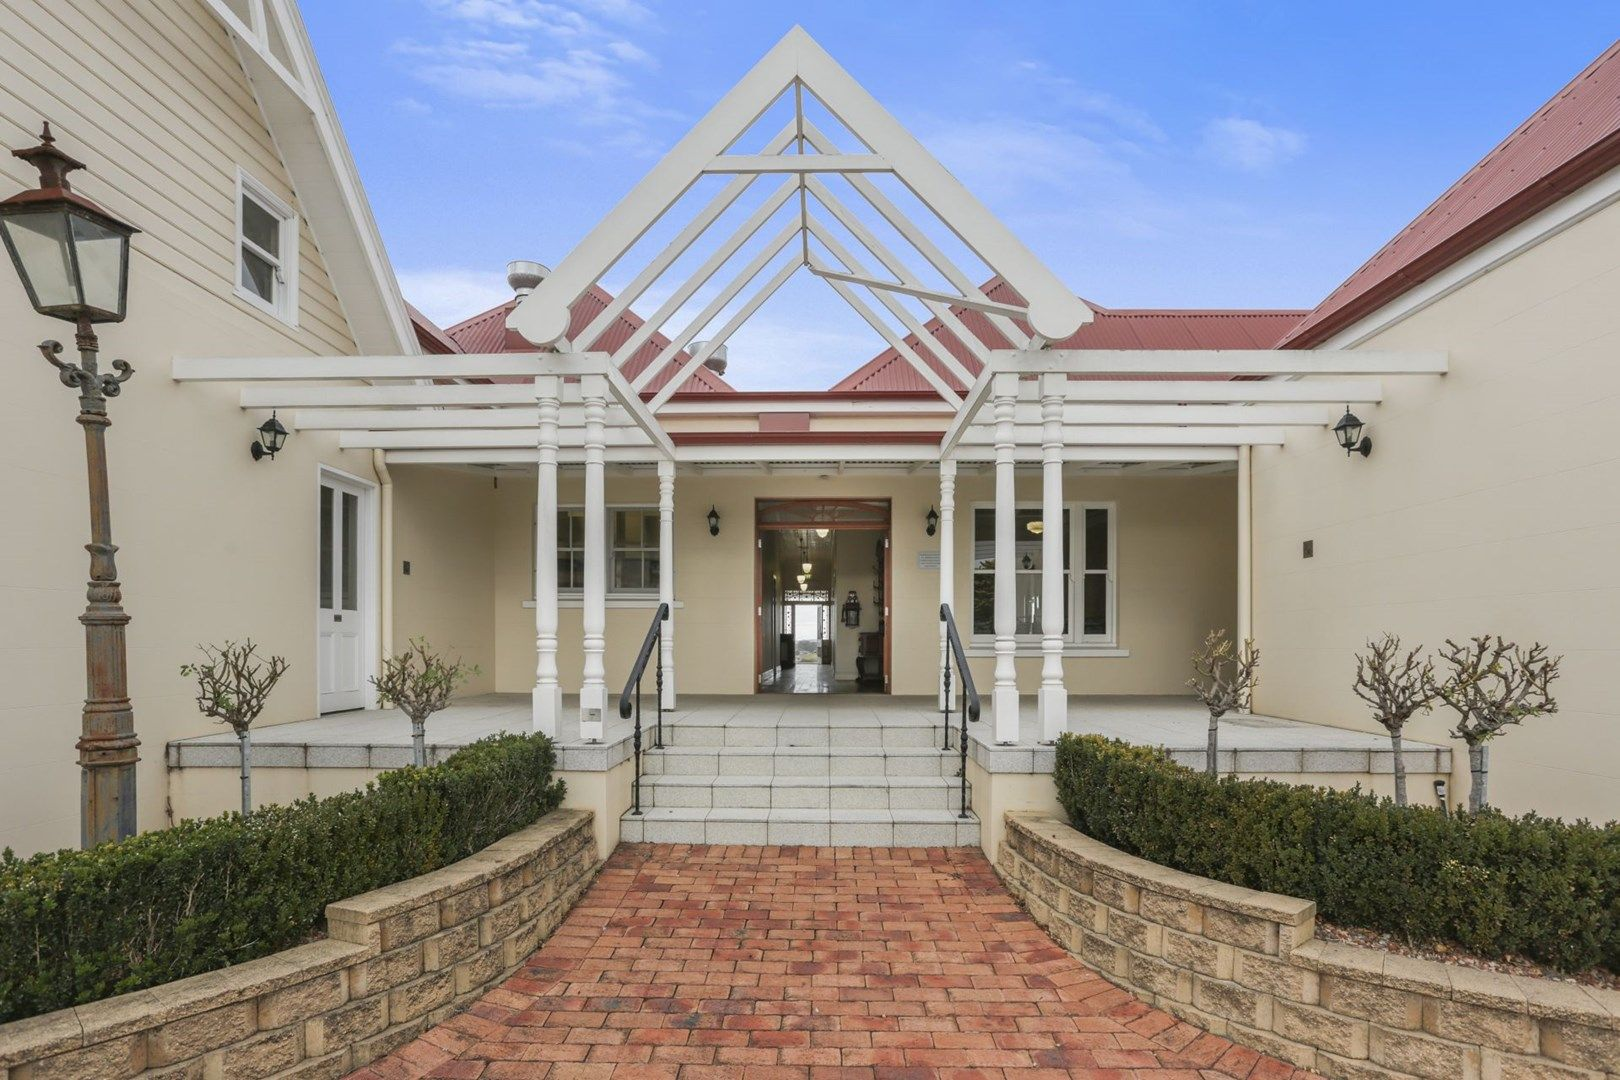 187-189 Newtown Road, Bega NSW 2550, Image 1